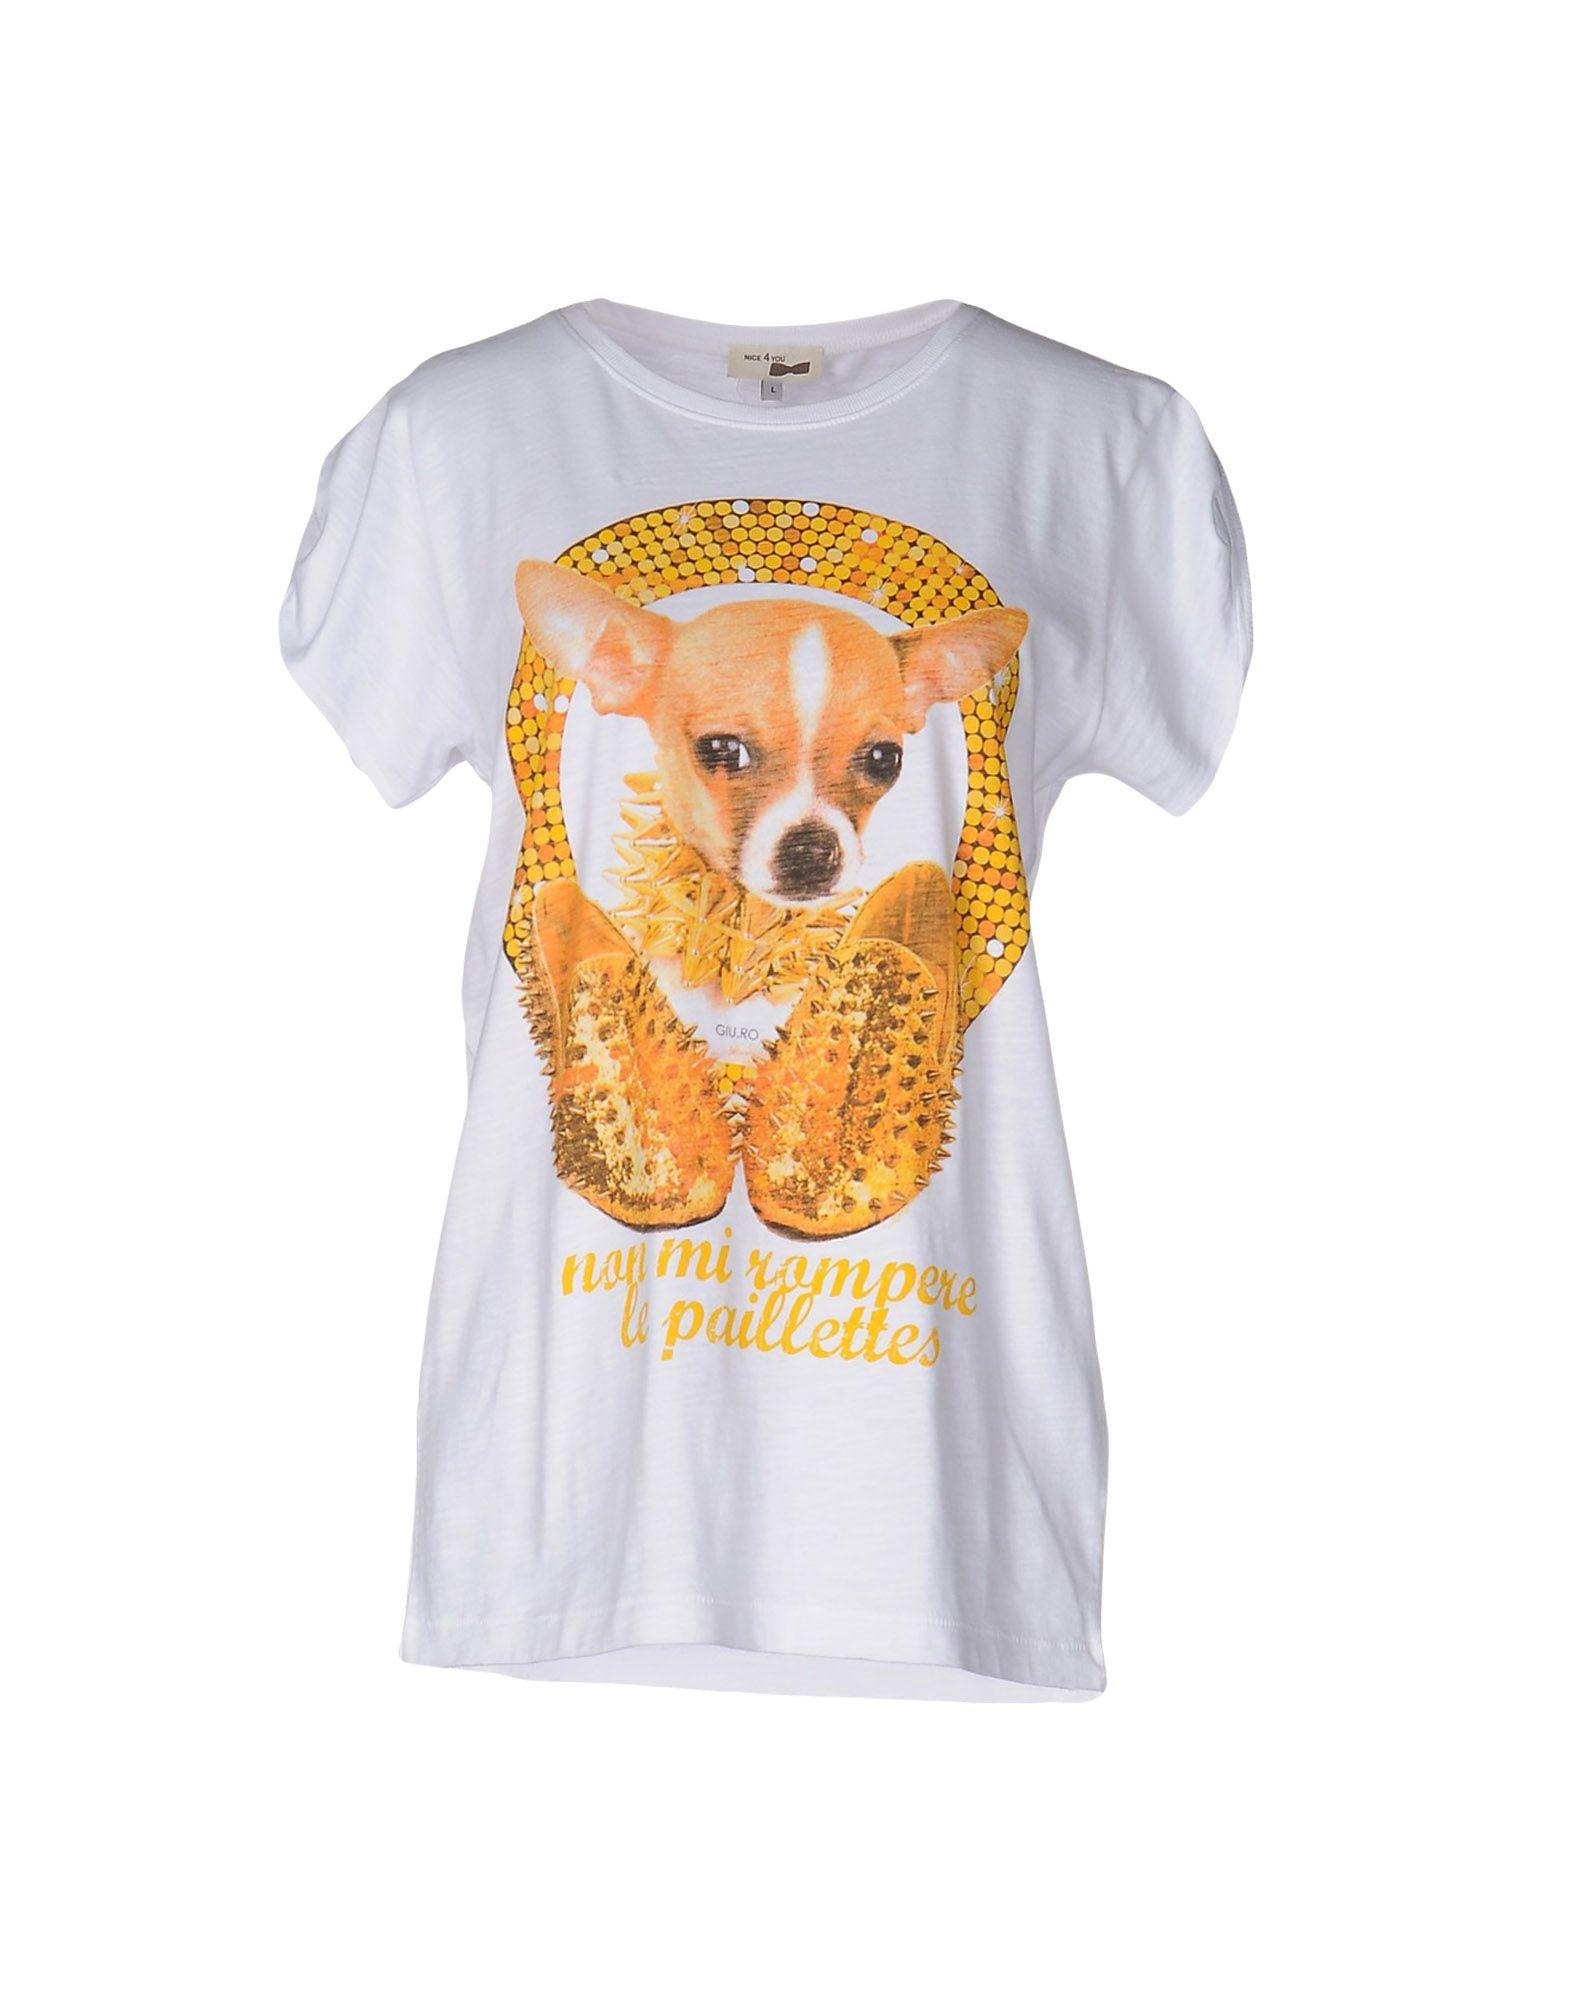 NICE 4 YOU T-shirts